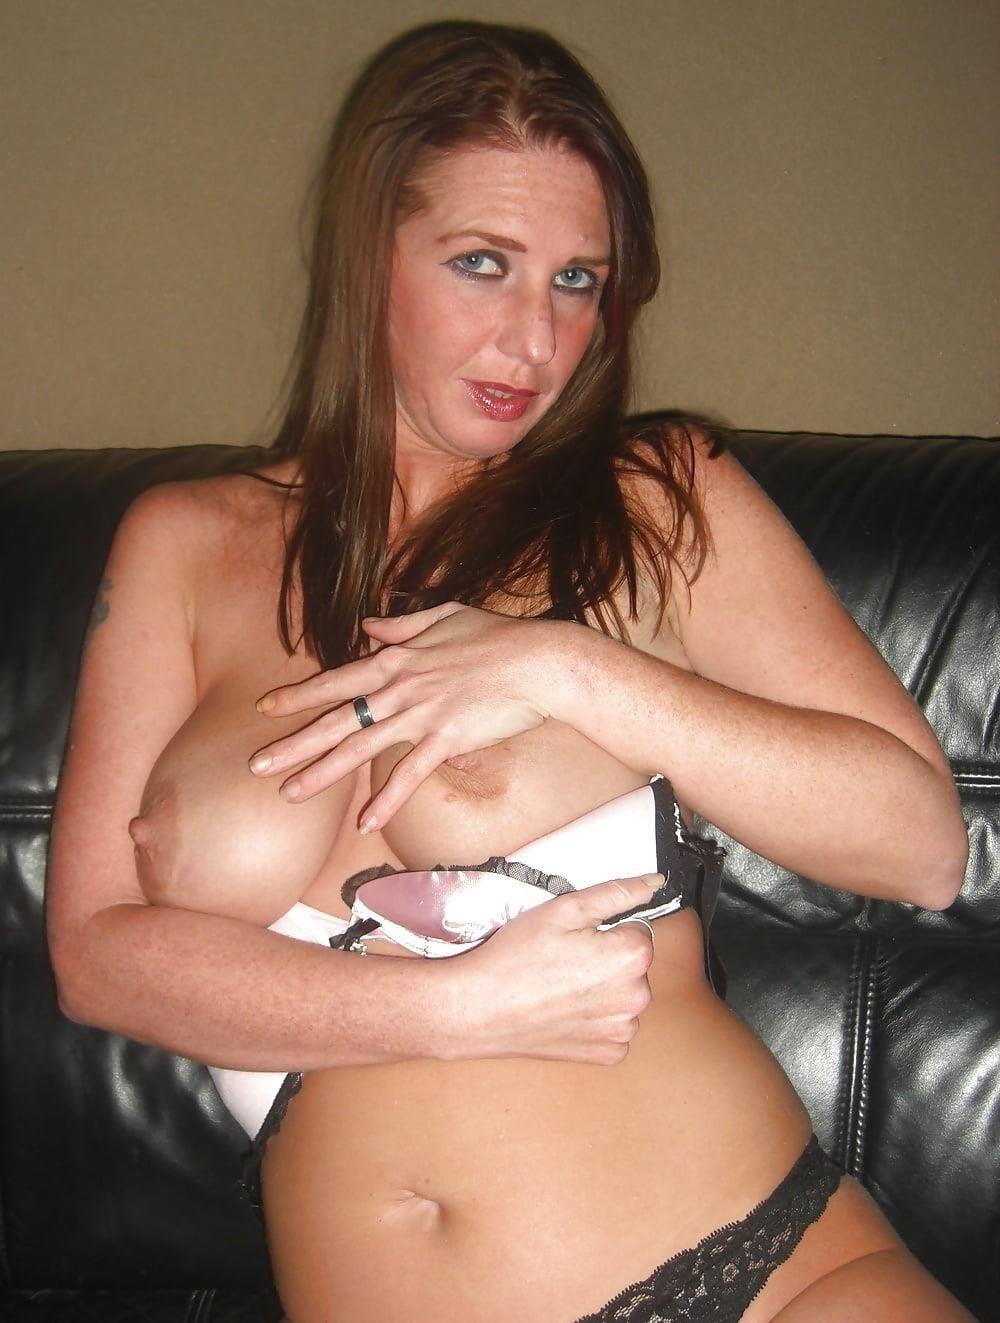 Big tit brunette pics-2561